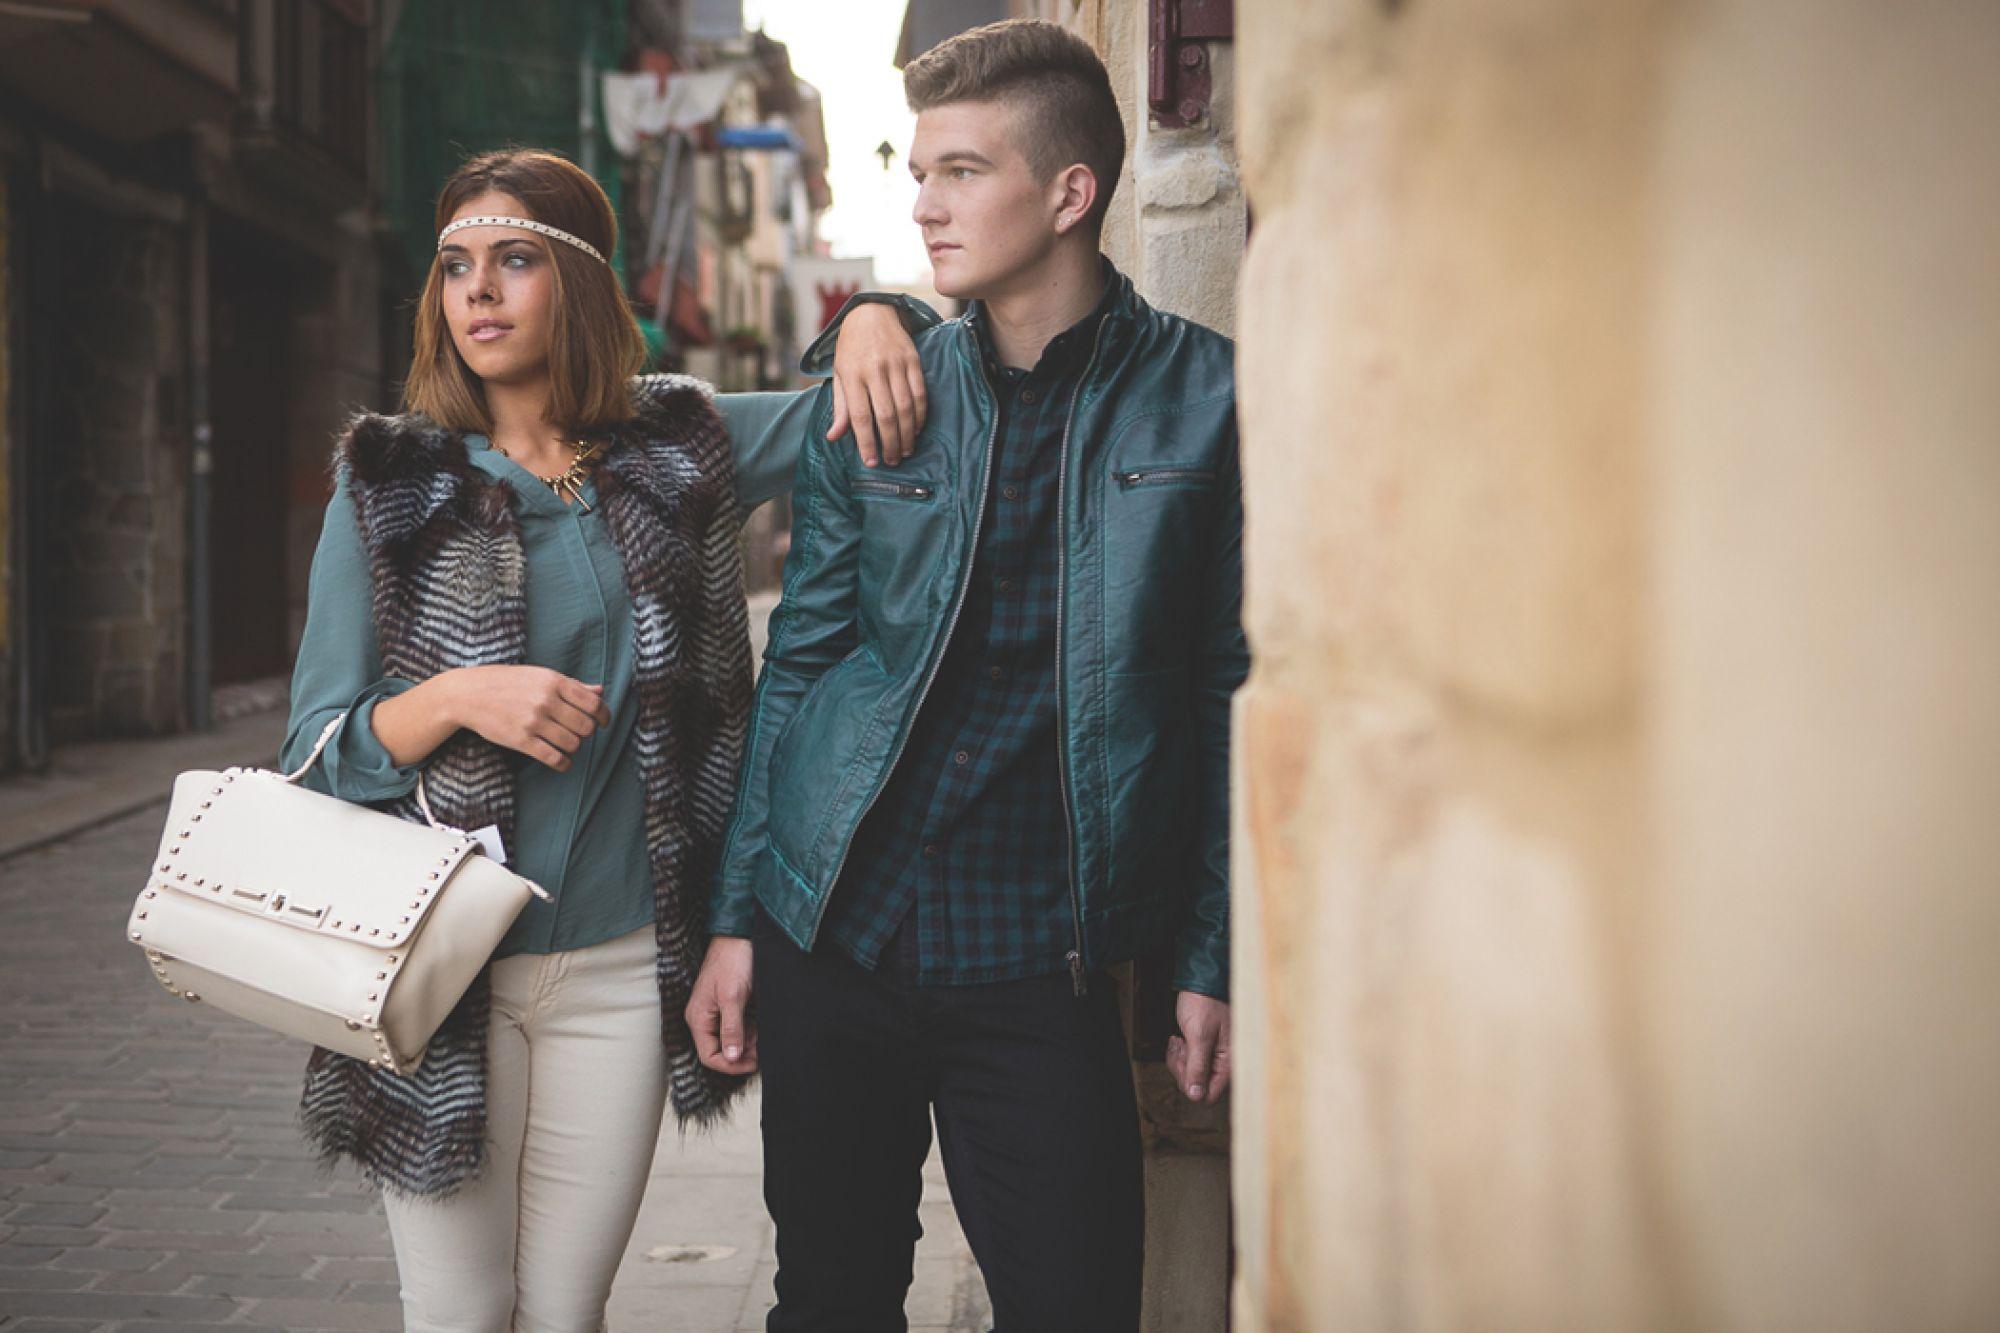 Fotos de Moda | Marcas de ropa